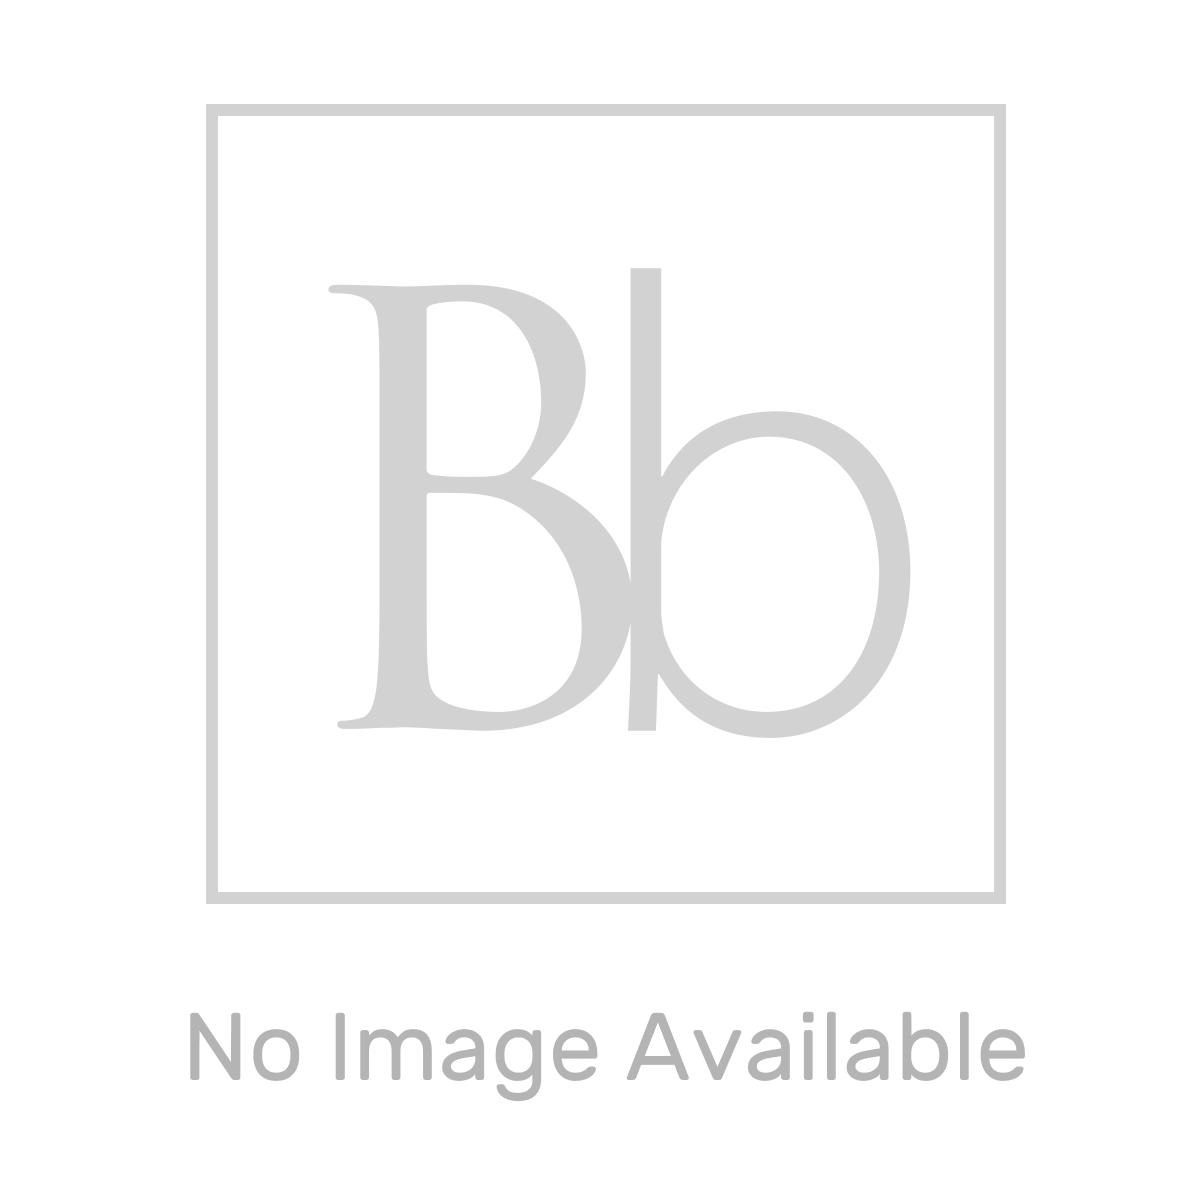 RAK Compact Special Needs Rimless Push Button Close Coupled Toilet